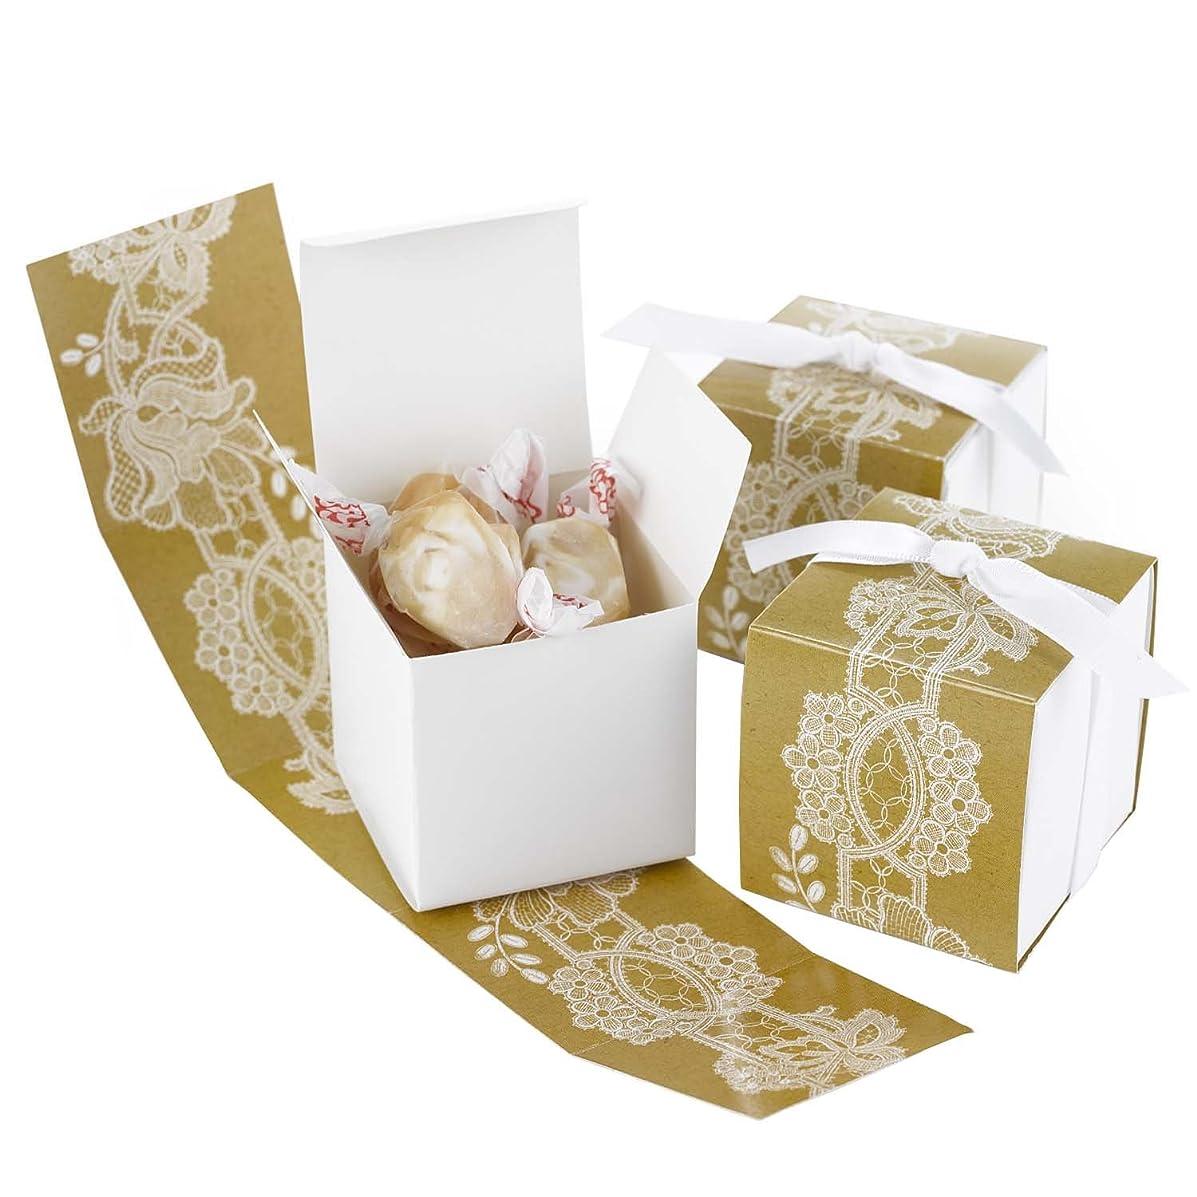 Hortense B Hewitt Rustic Lace Wrap Favor Boxes, 25-Pack